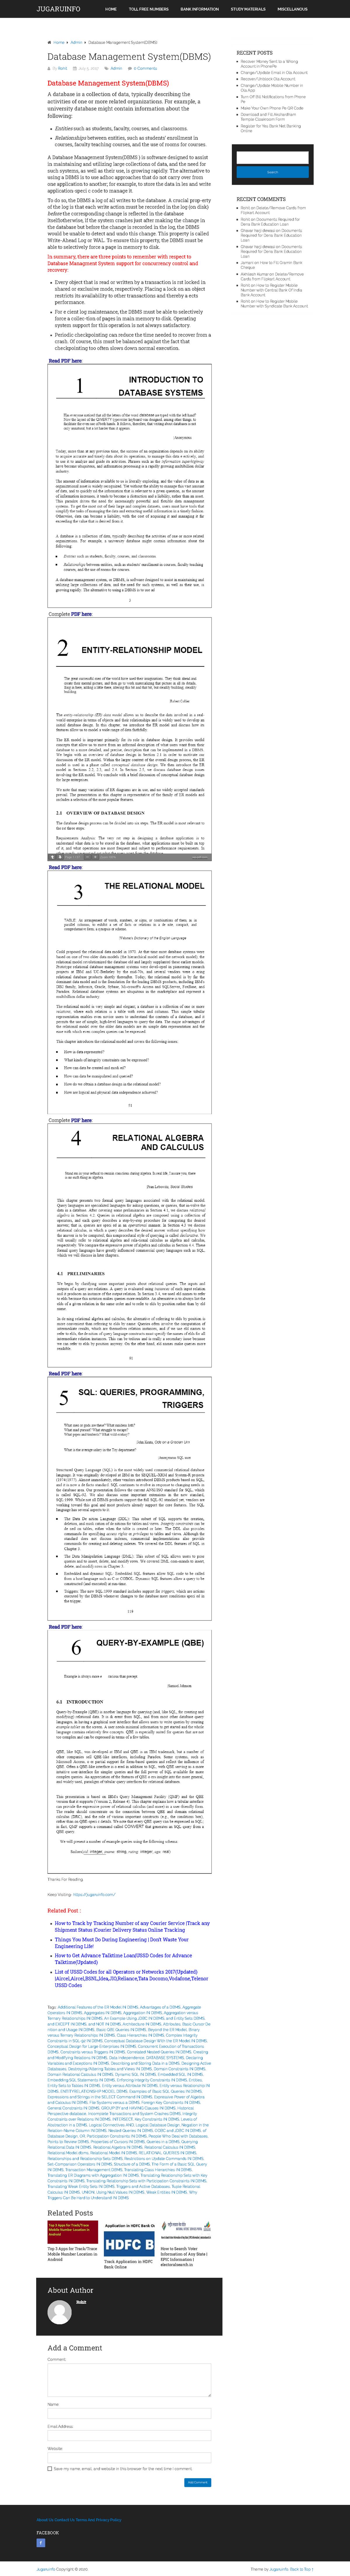 Database Management System Dbms Jugaruinfo Cs404pc Studocu